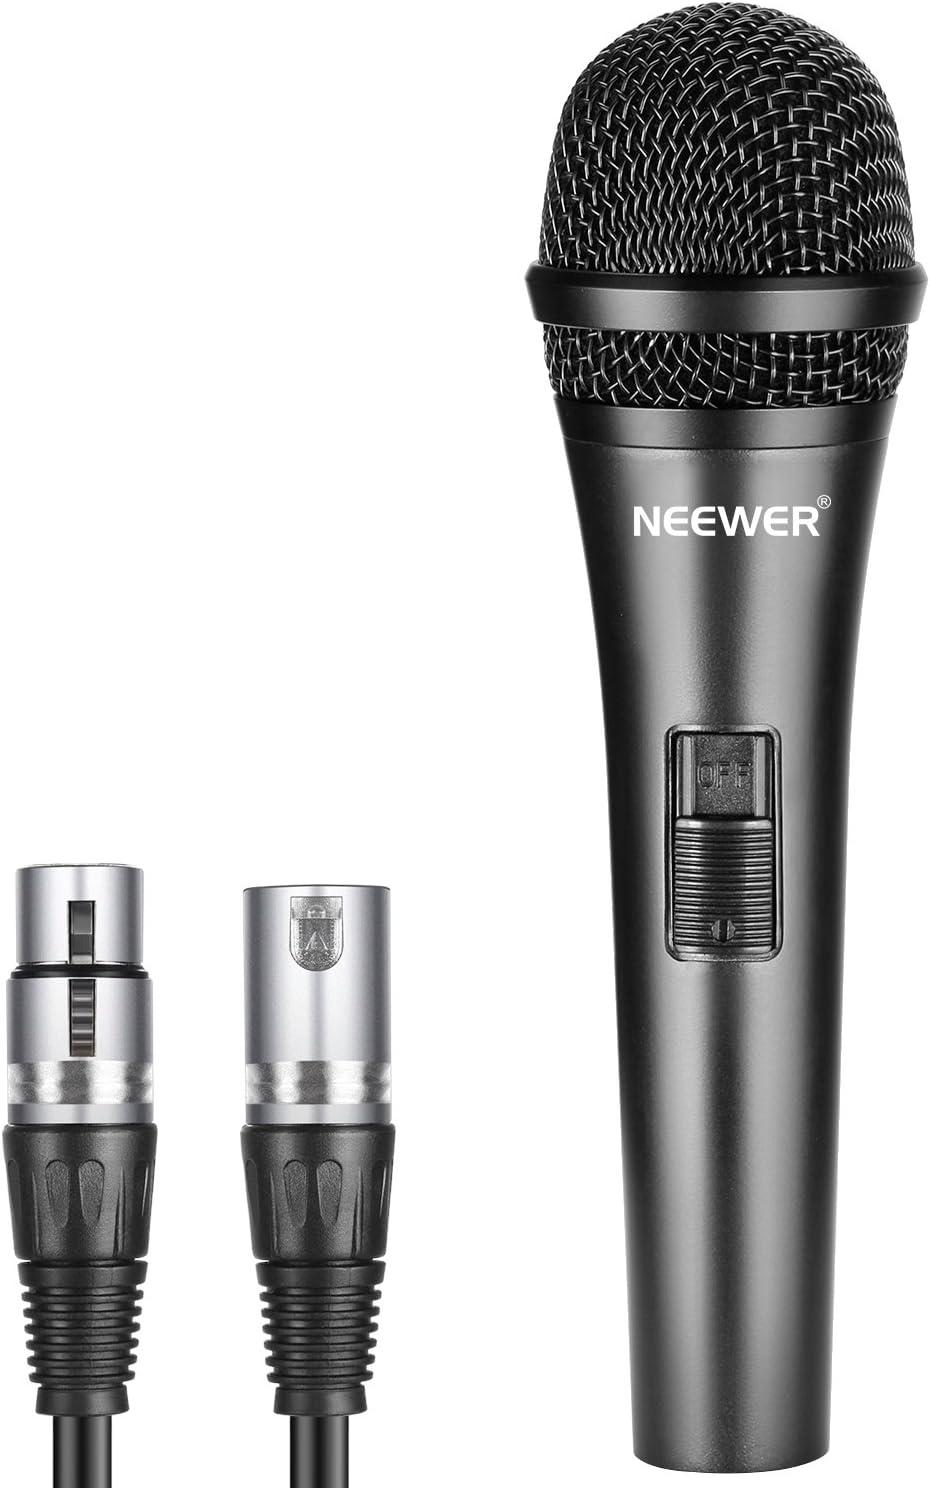 Neewer Cardioide Micrófono Dinámico con Cable XLR Macho a XLR Hembra,Construcción de Metal Rígido para Recogida de Instrumento Musical Profesional,Vocales,Radiodifusión,Conferencia,Negro(NW-040)